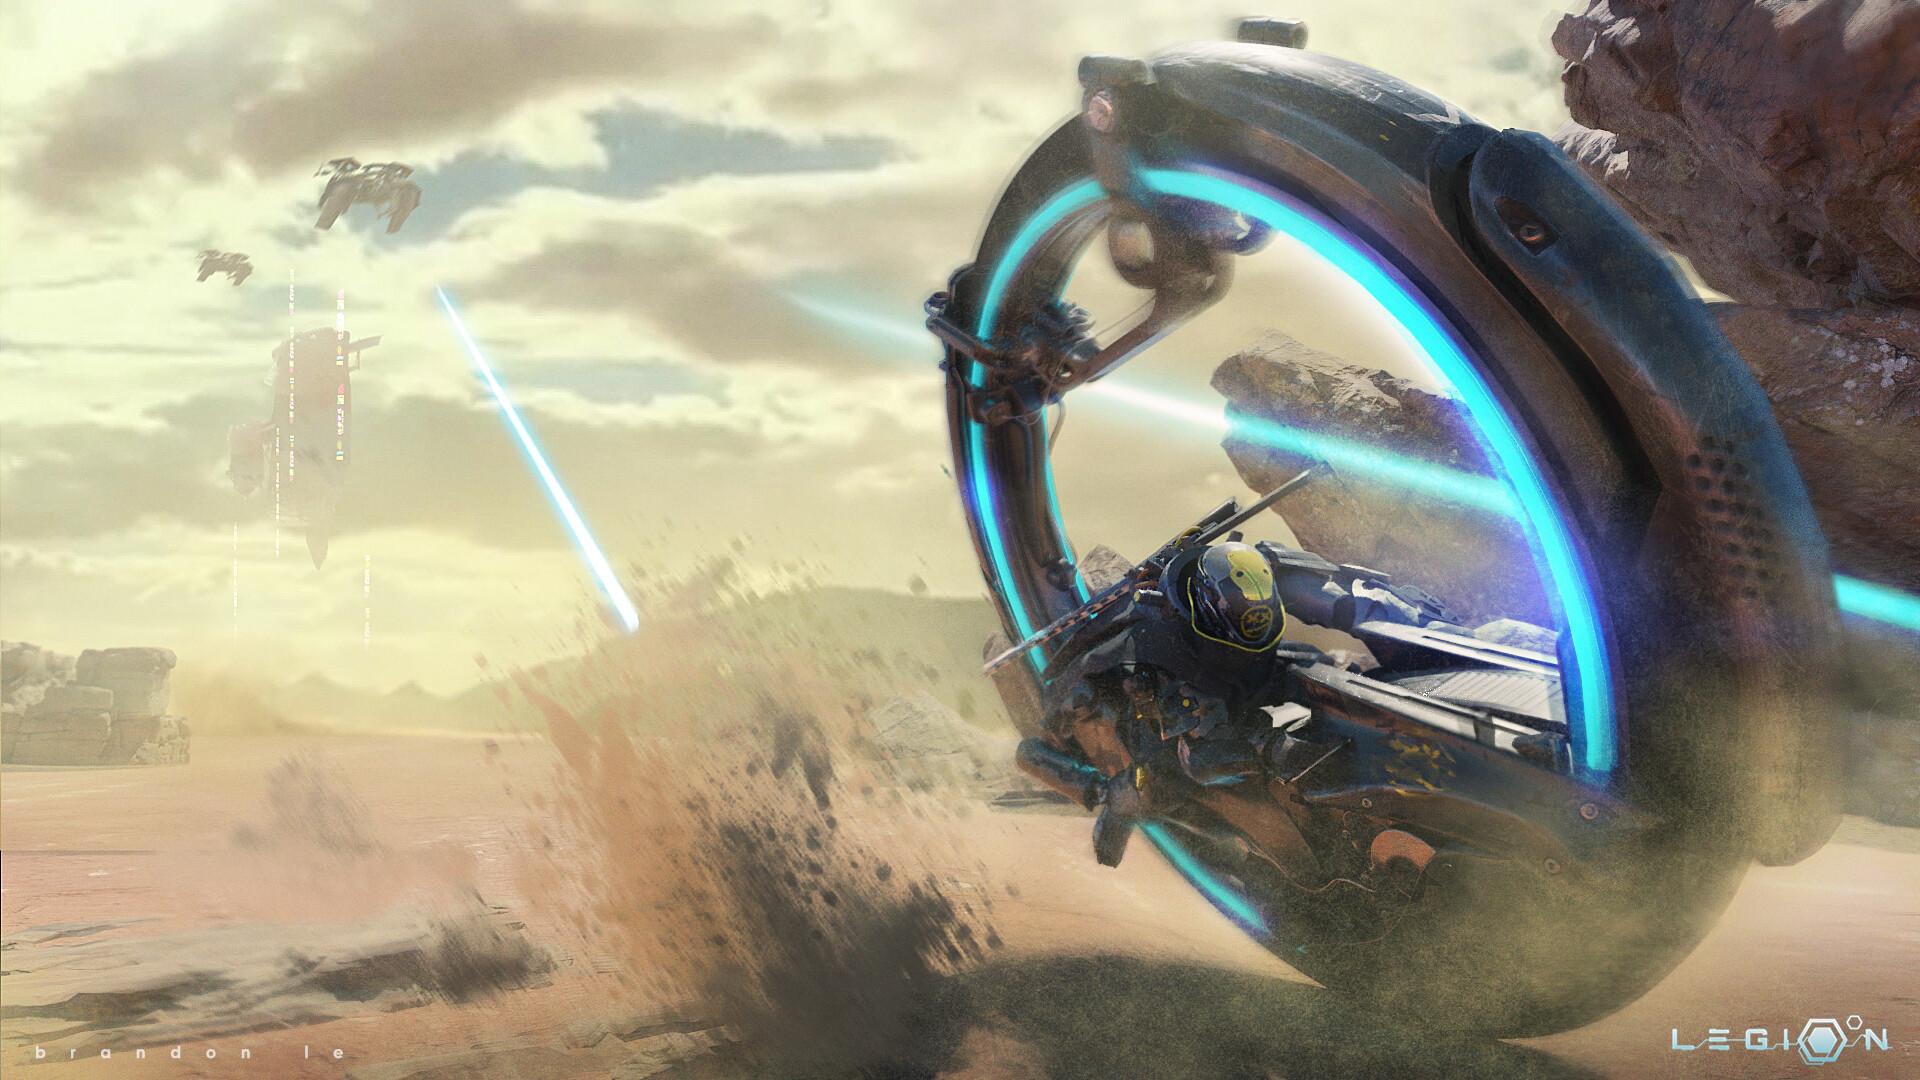 The Superb Science Fiction Art of Brandon Le